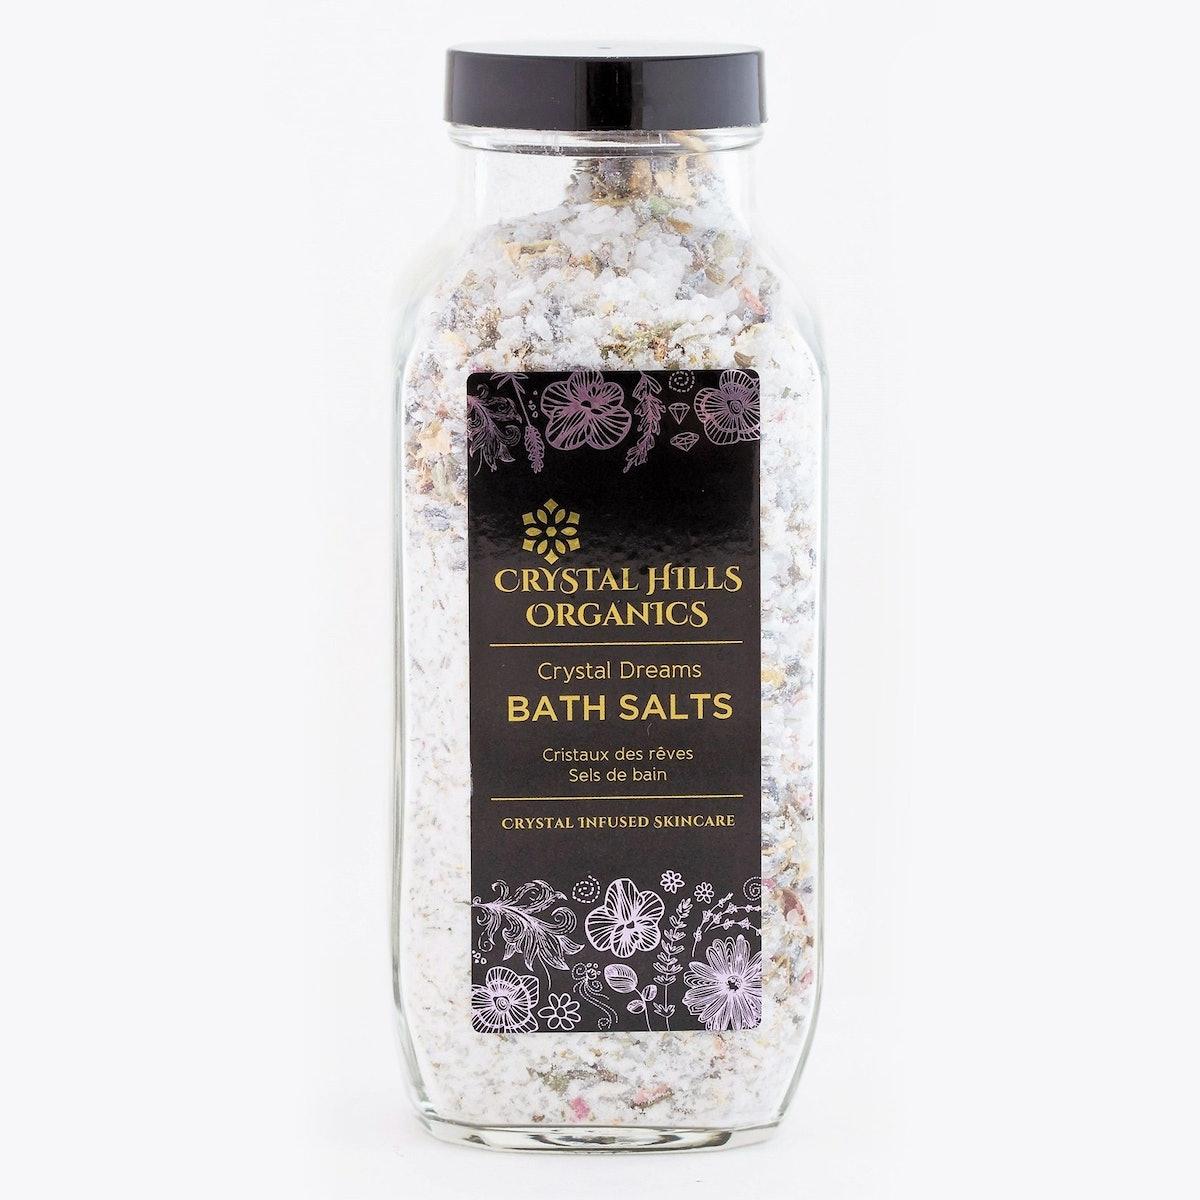 Crystal Hills Organics Crystal Dreams Bath Salts